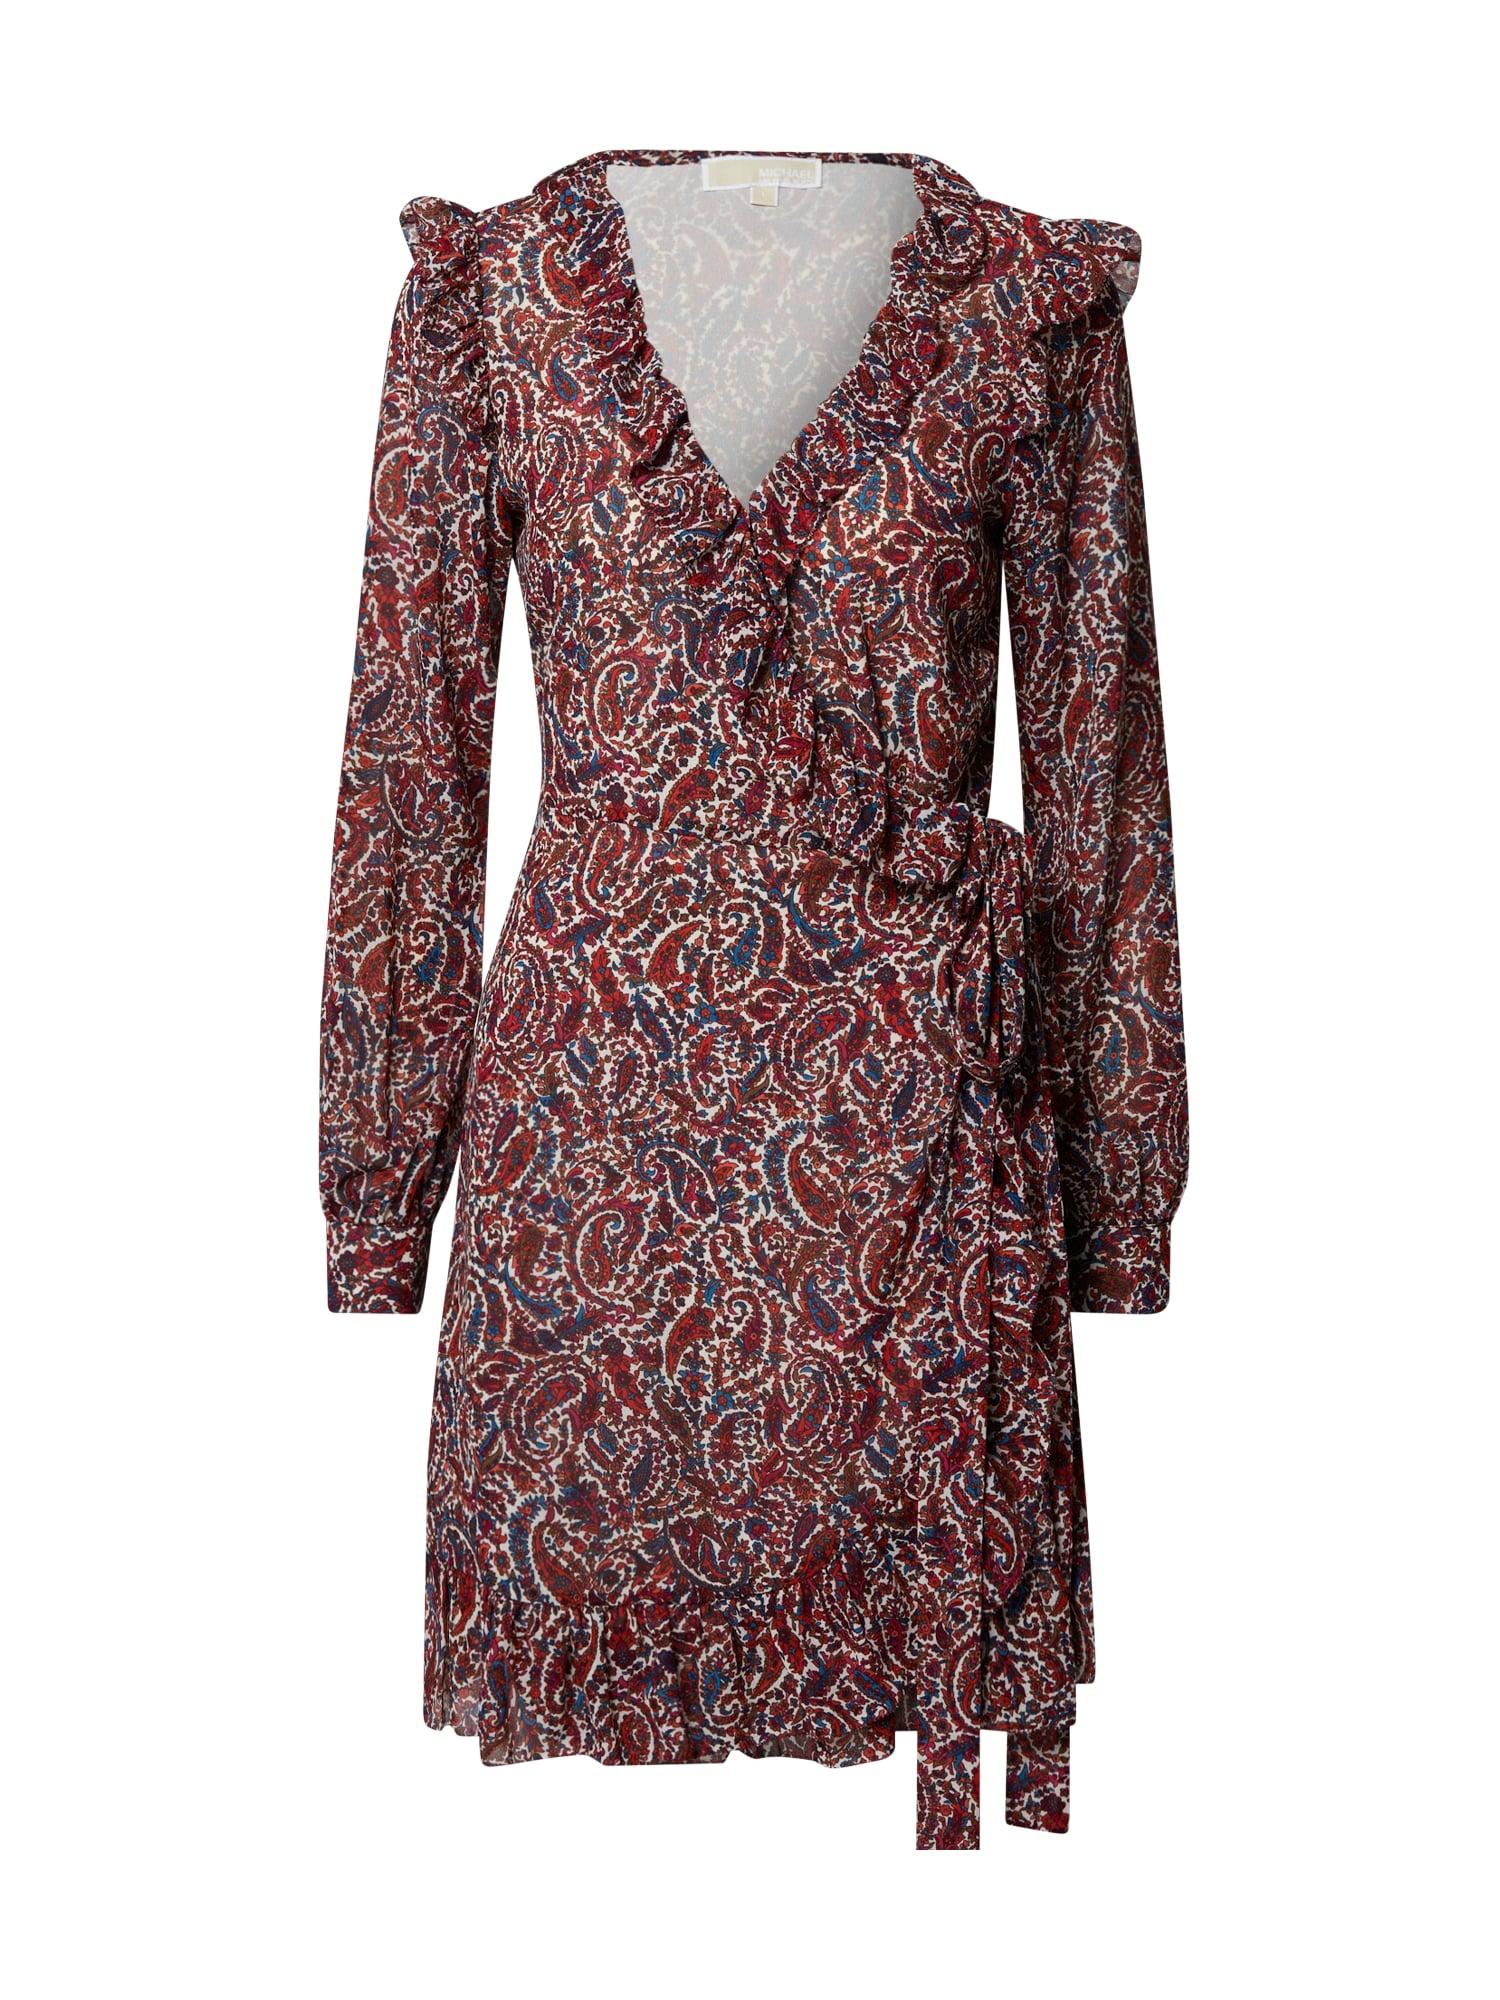 MICHAEL Michael Kors Suknelė vyno raudona spalva / melionų spalva / balta / dangaus žydra / mišrios spalvos